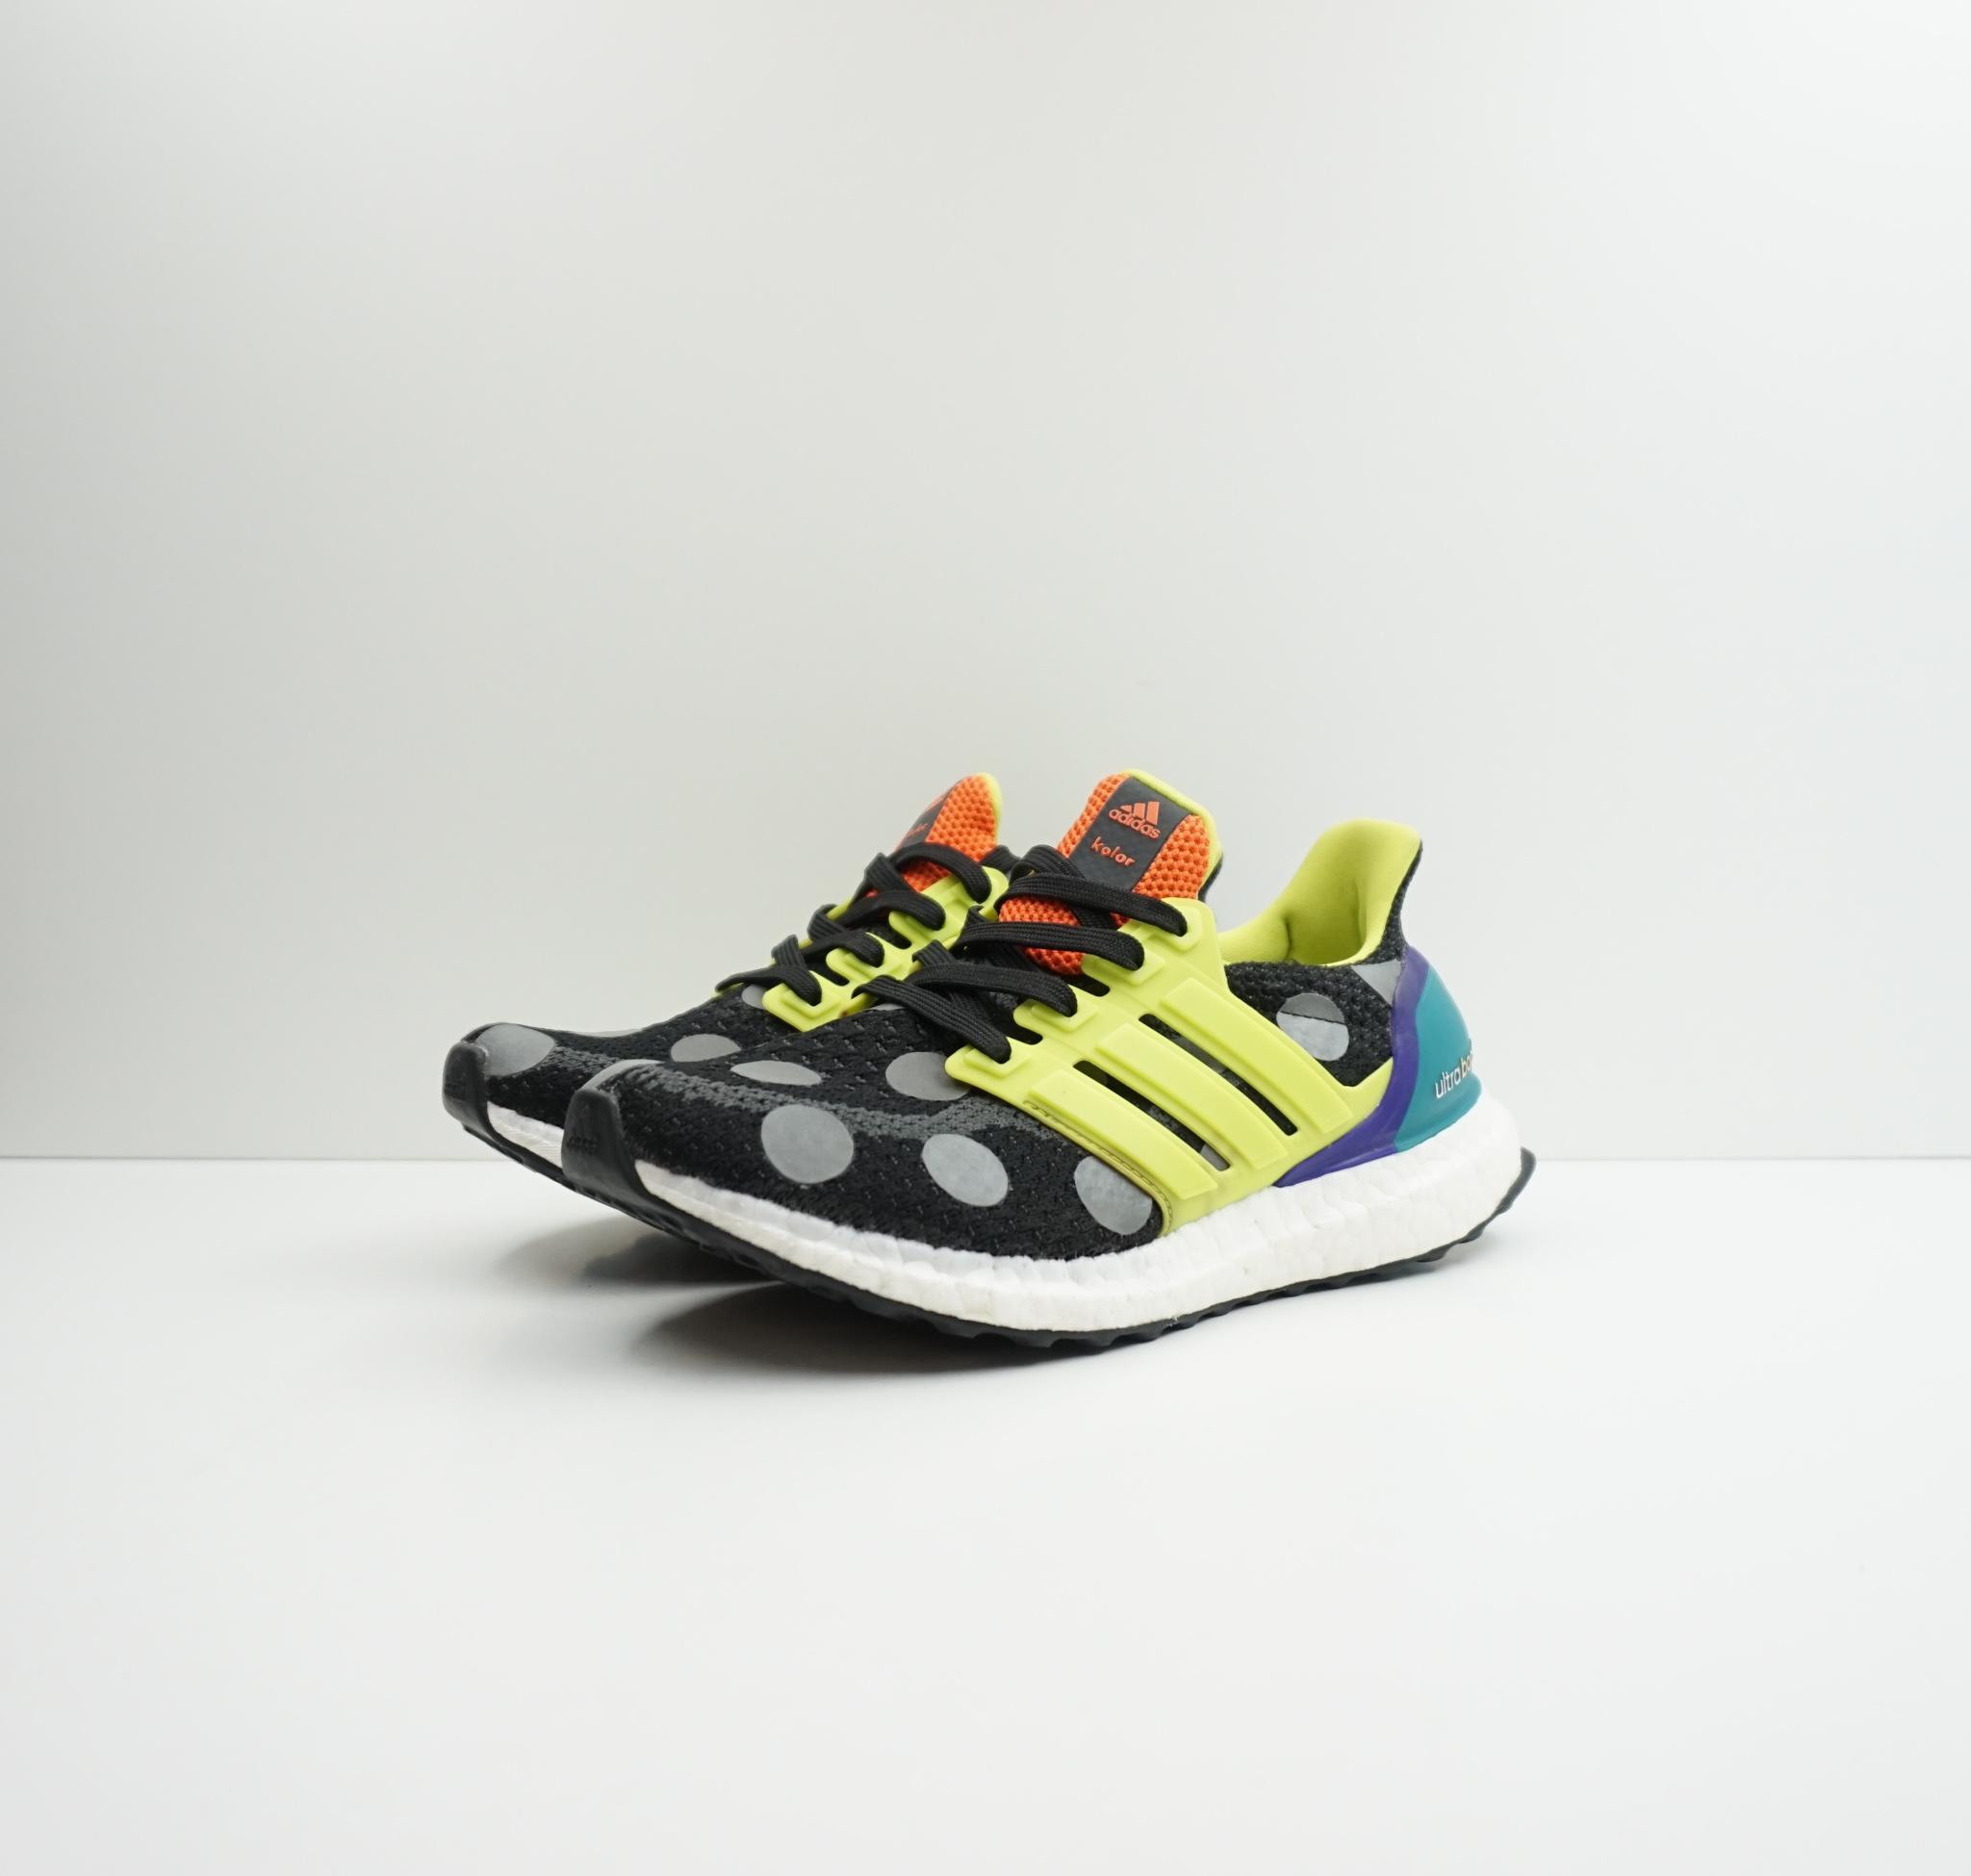 Adidas Ultra Boost 2.0 Kolor Polka Dot